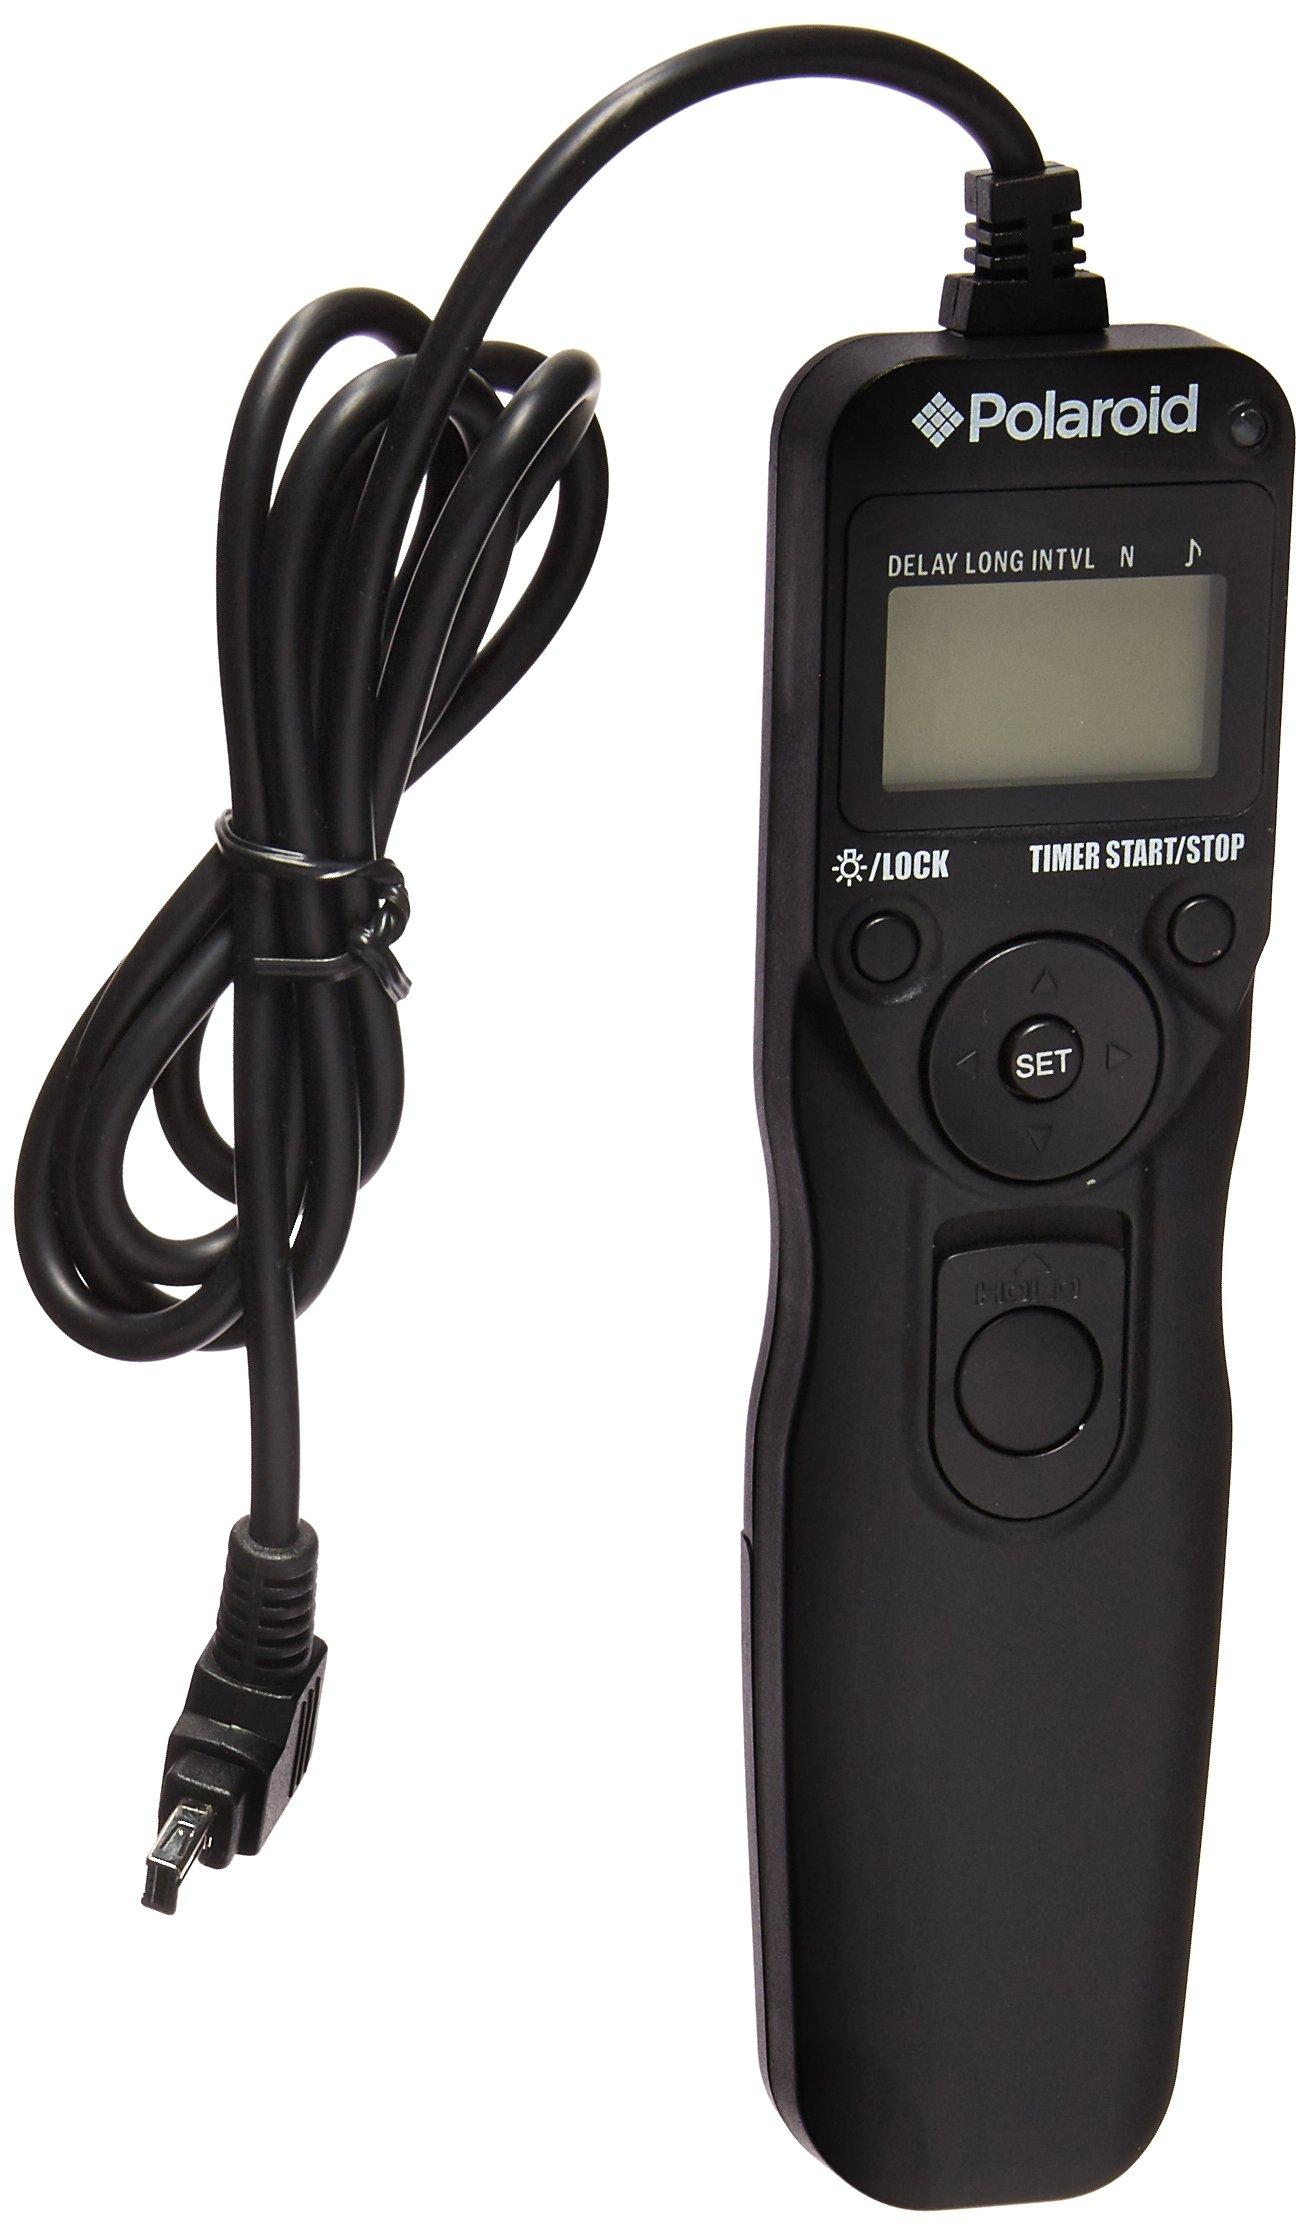 Polaroid Shutter Release Timer Remote Control For Nikon D90, D3100, D3200, D3300, D5000, D5100, D5200, D5300, D7000, D7100, D750, DF, D600, D610, P7700, P7800 Digital SLR Cameras